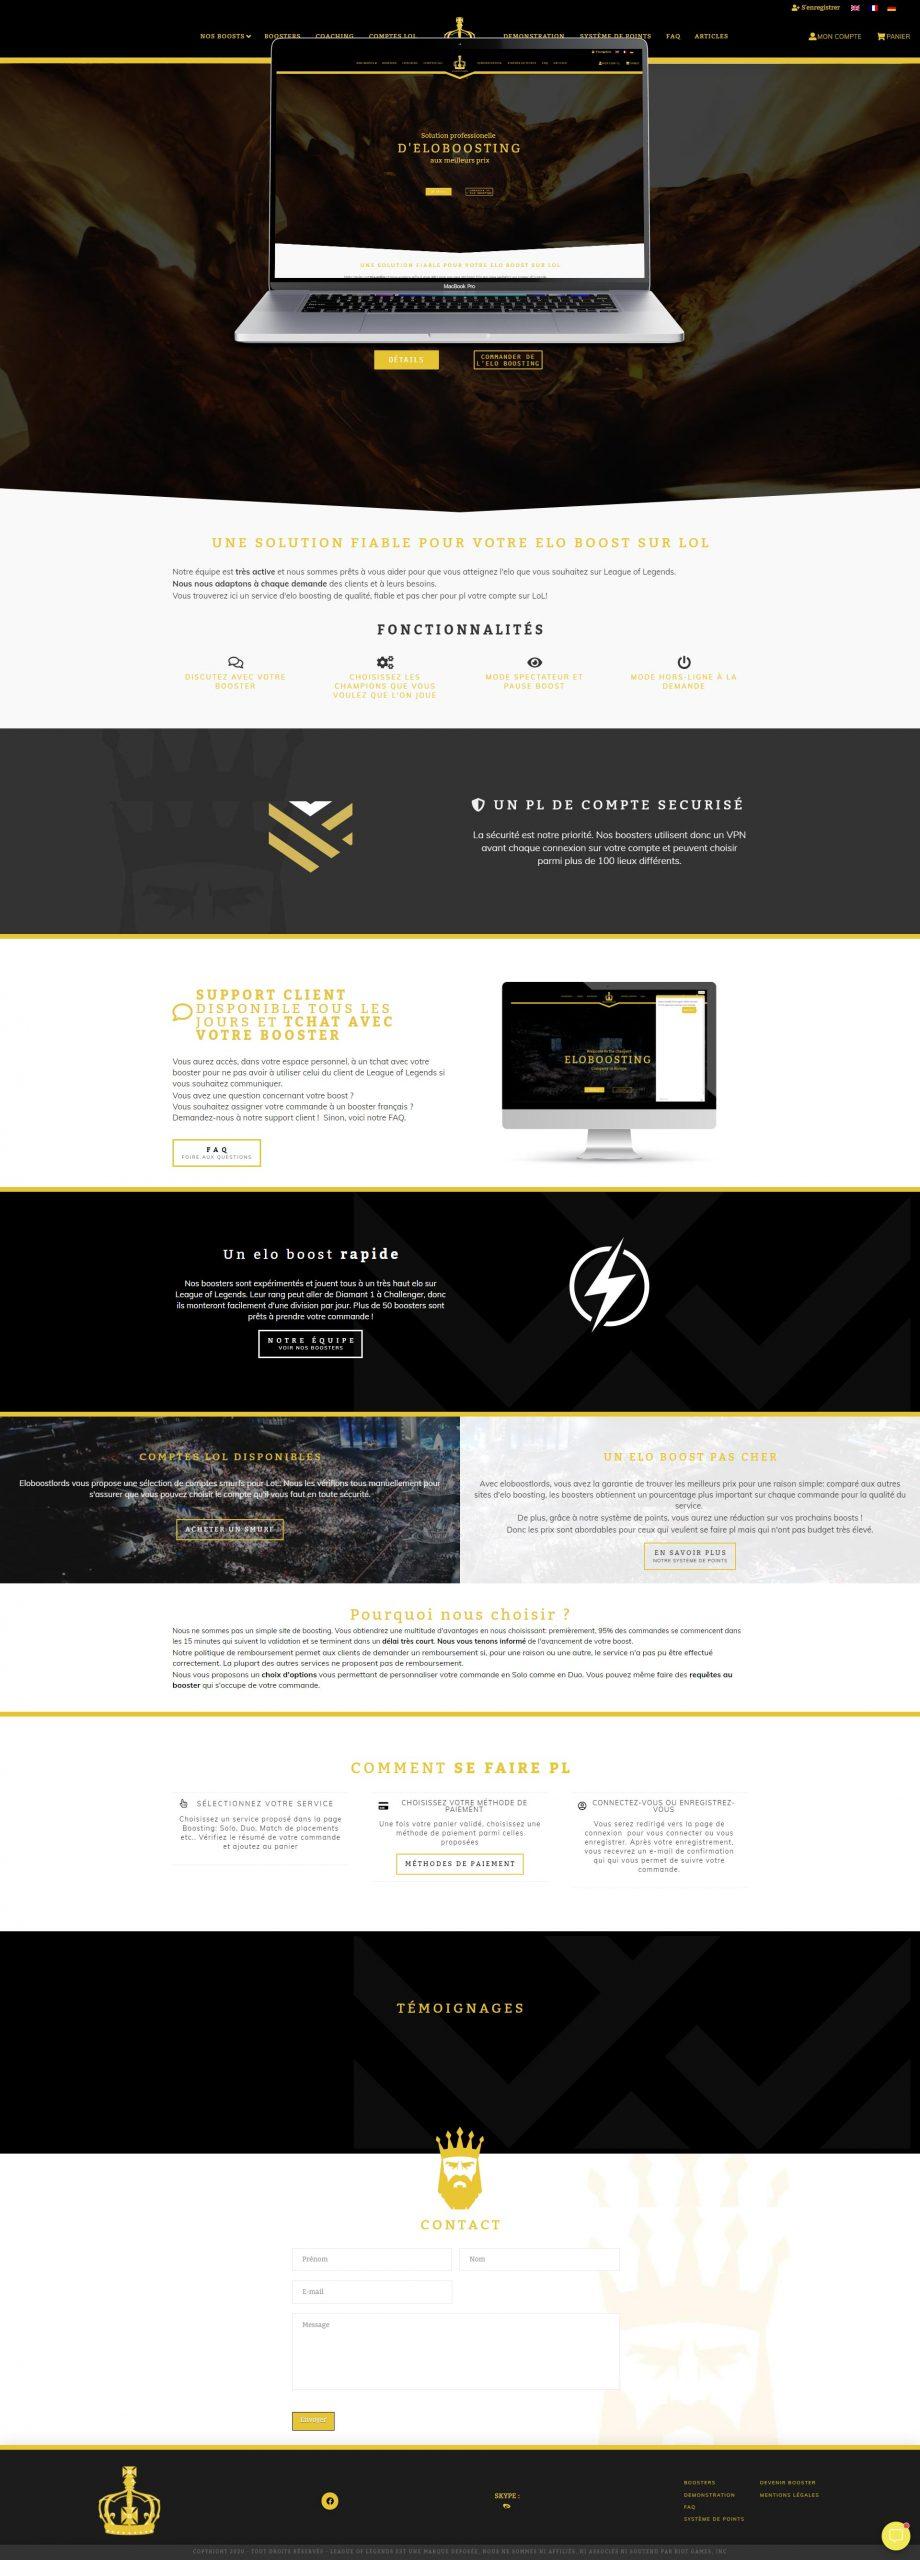 site-internet-wordpress-developpement-ecommerce-2